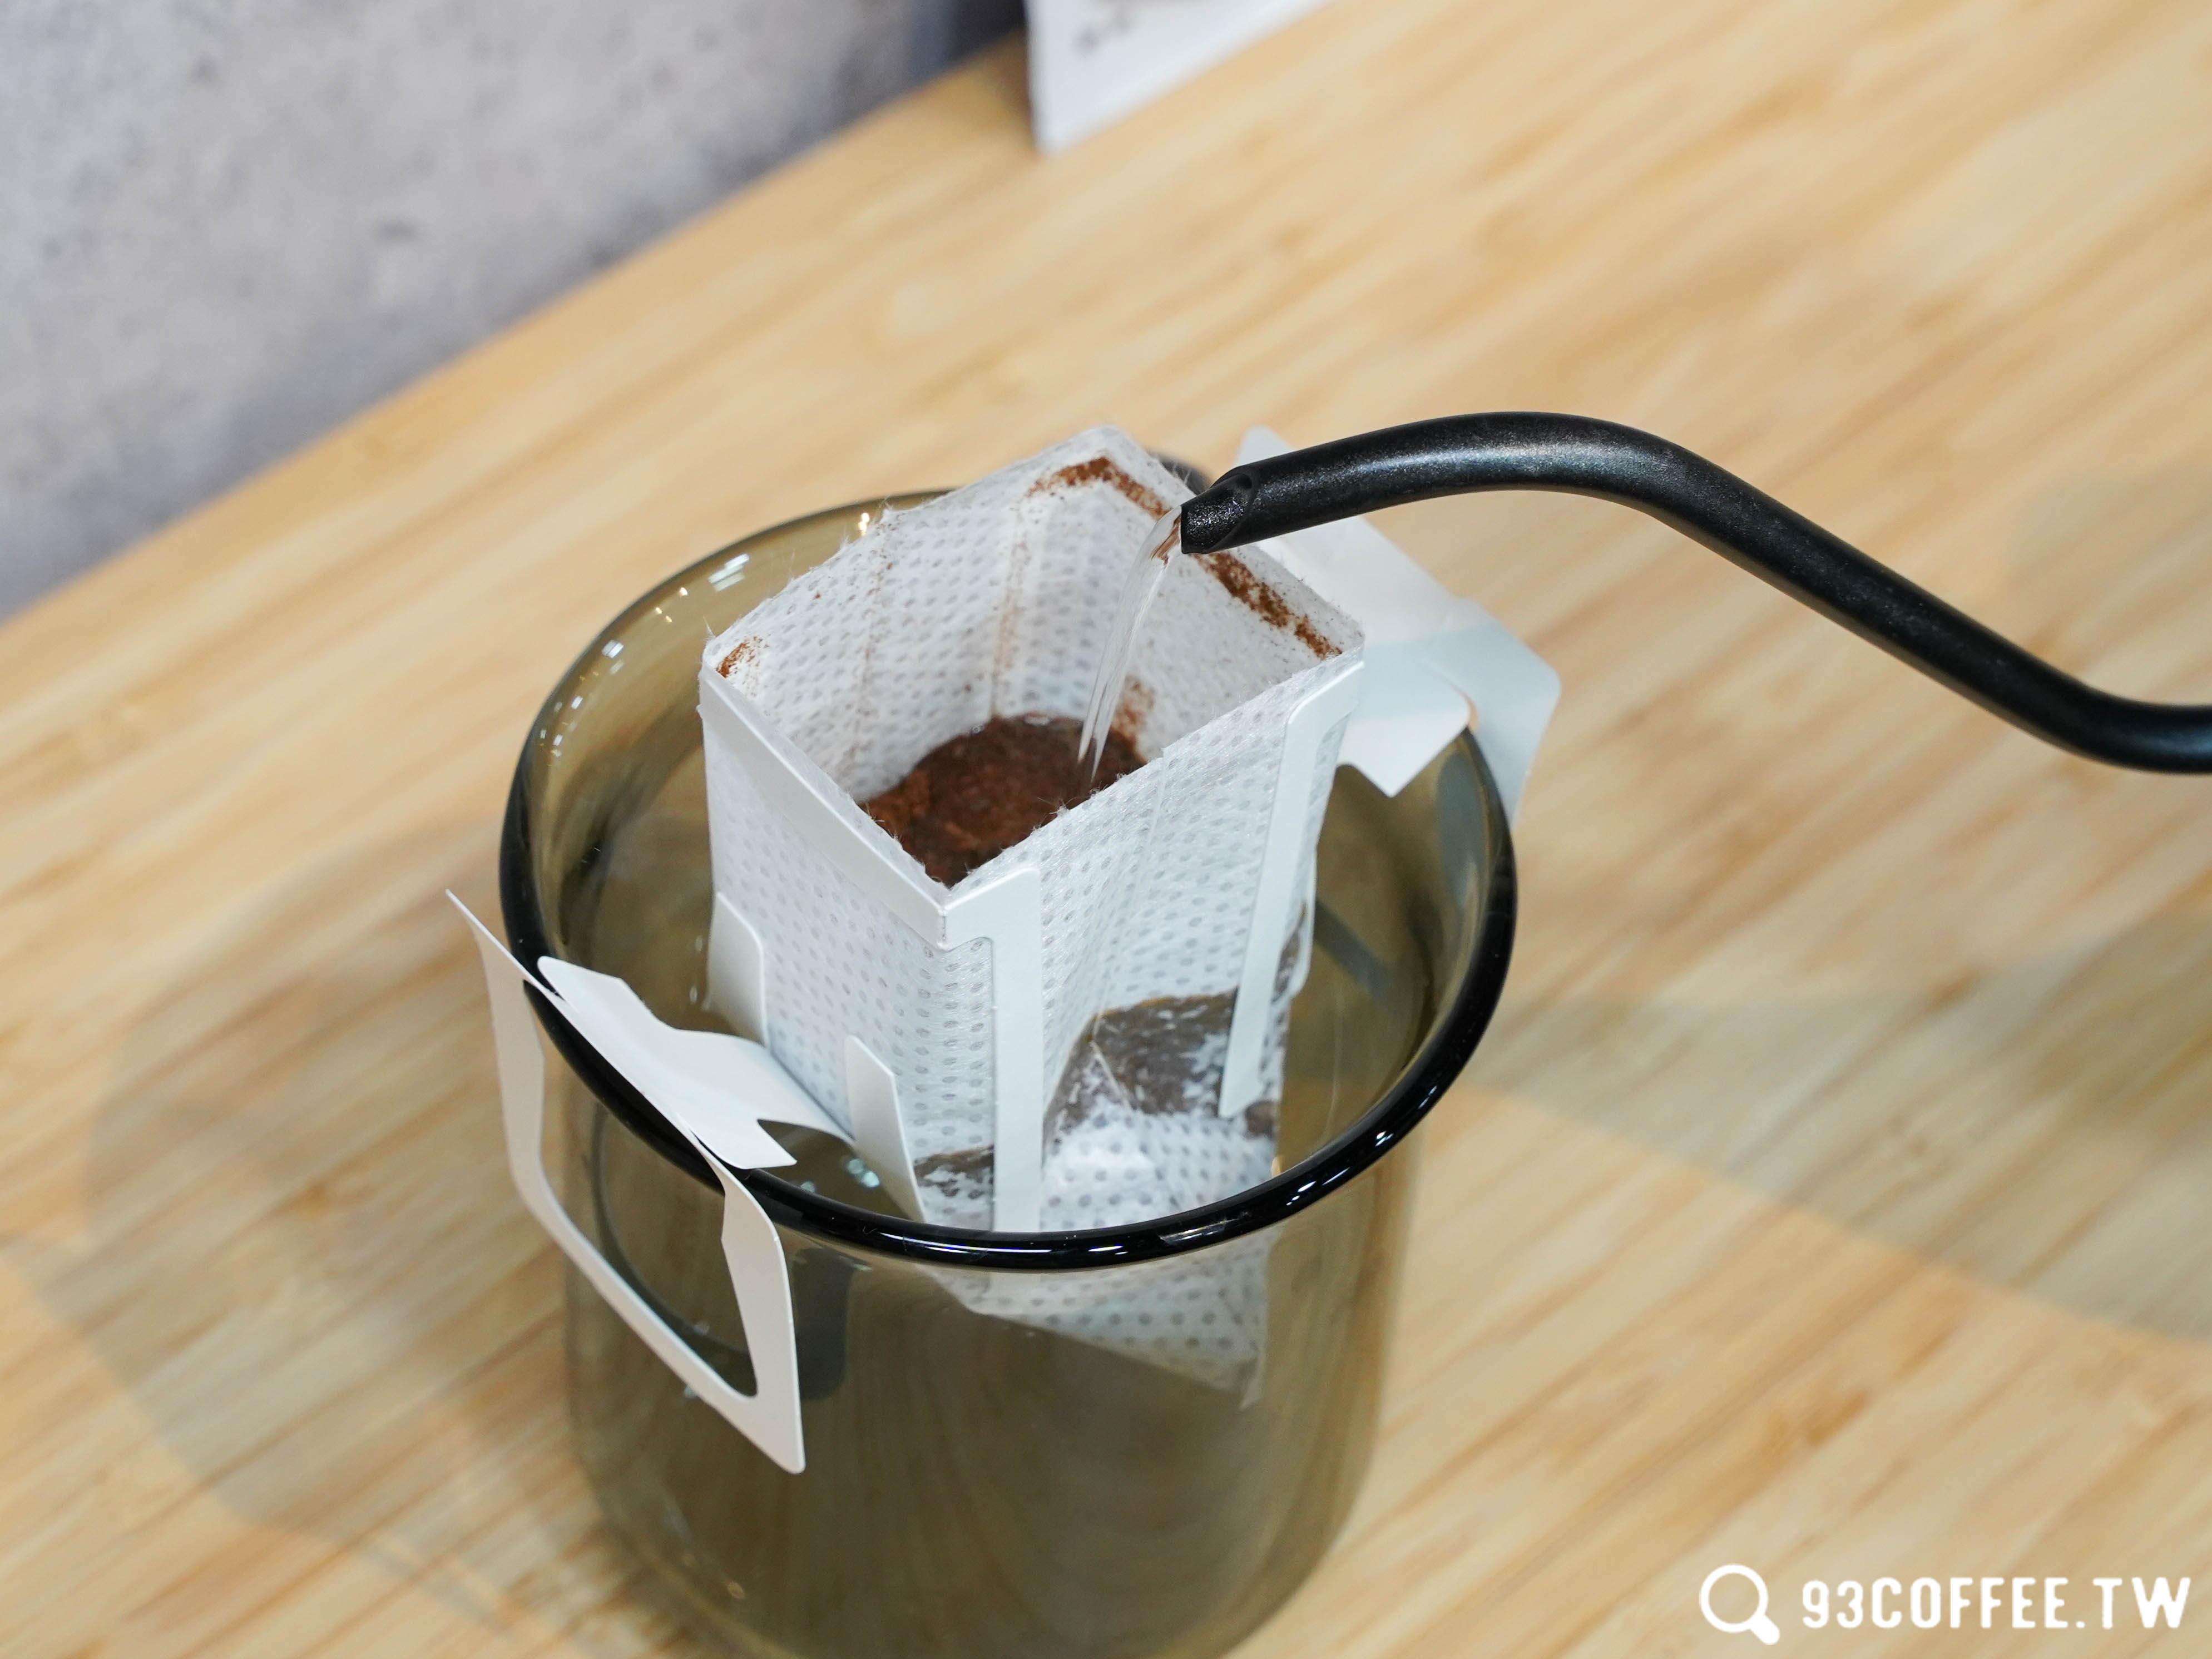 93 coffee 咖啡掛耳包 100%研磨咖啡 濾掛咖啡 掛耳包 濾掛包 淺中焙『93coffeewholesale』